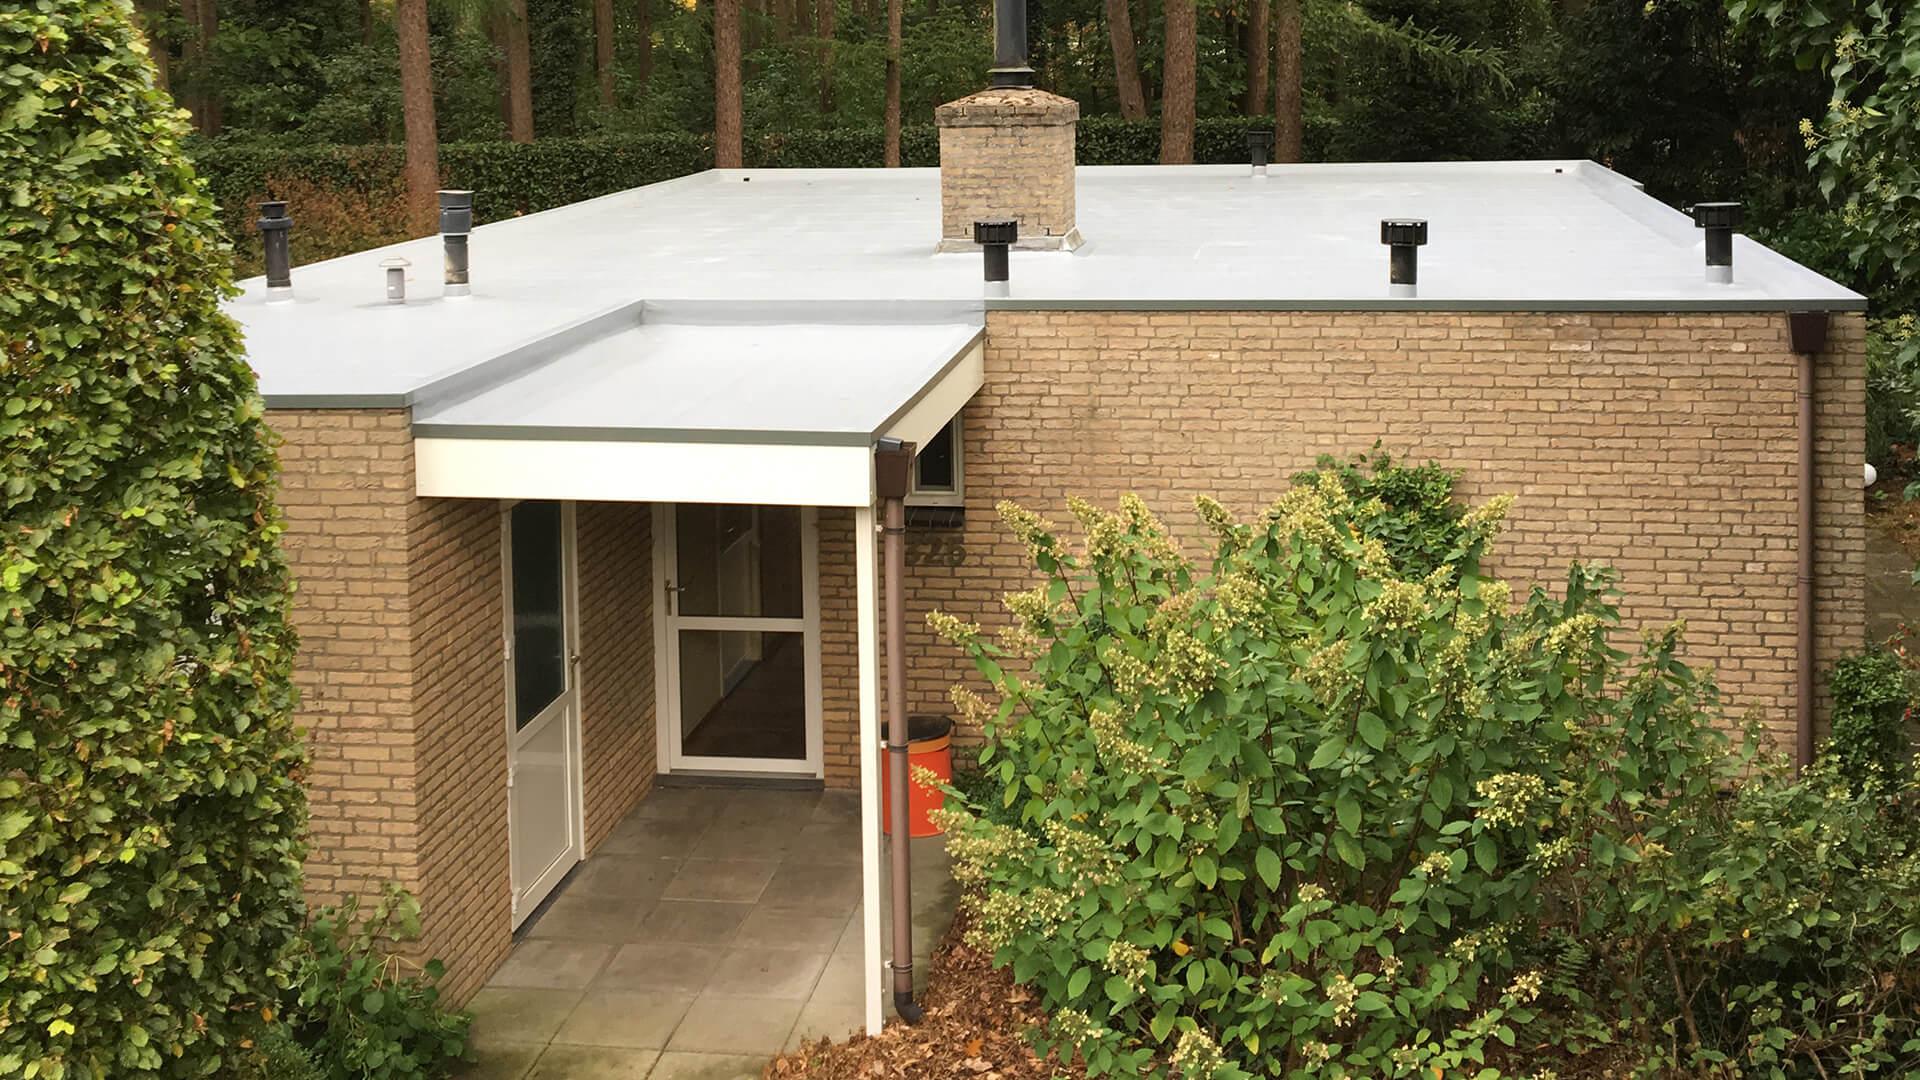 Renovatie dak vakantiebungalow Lochem